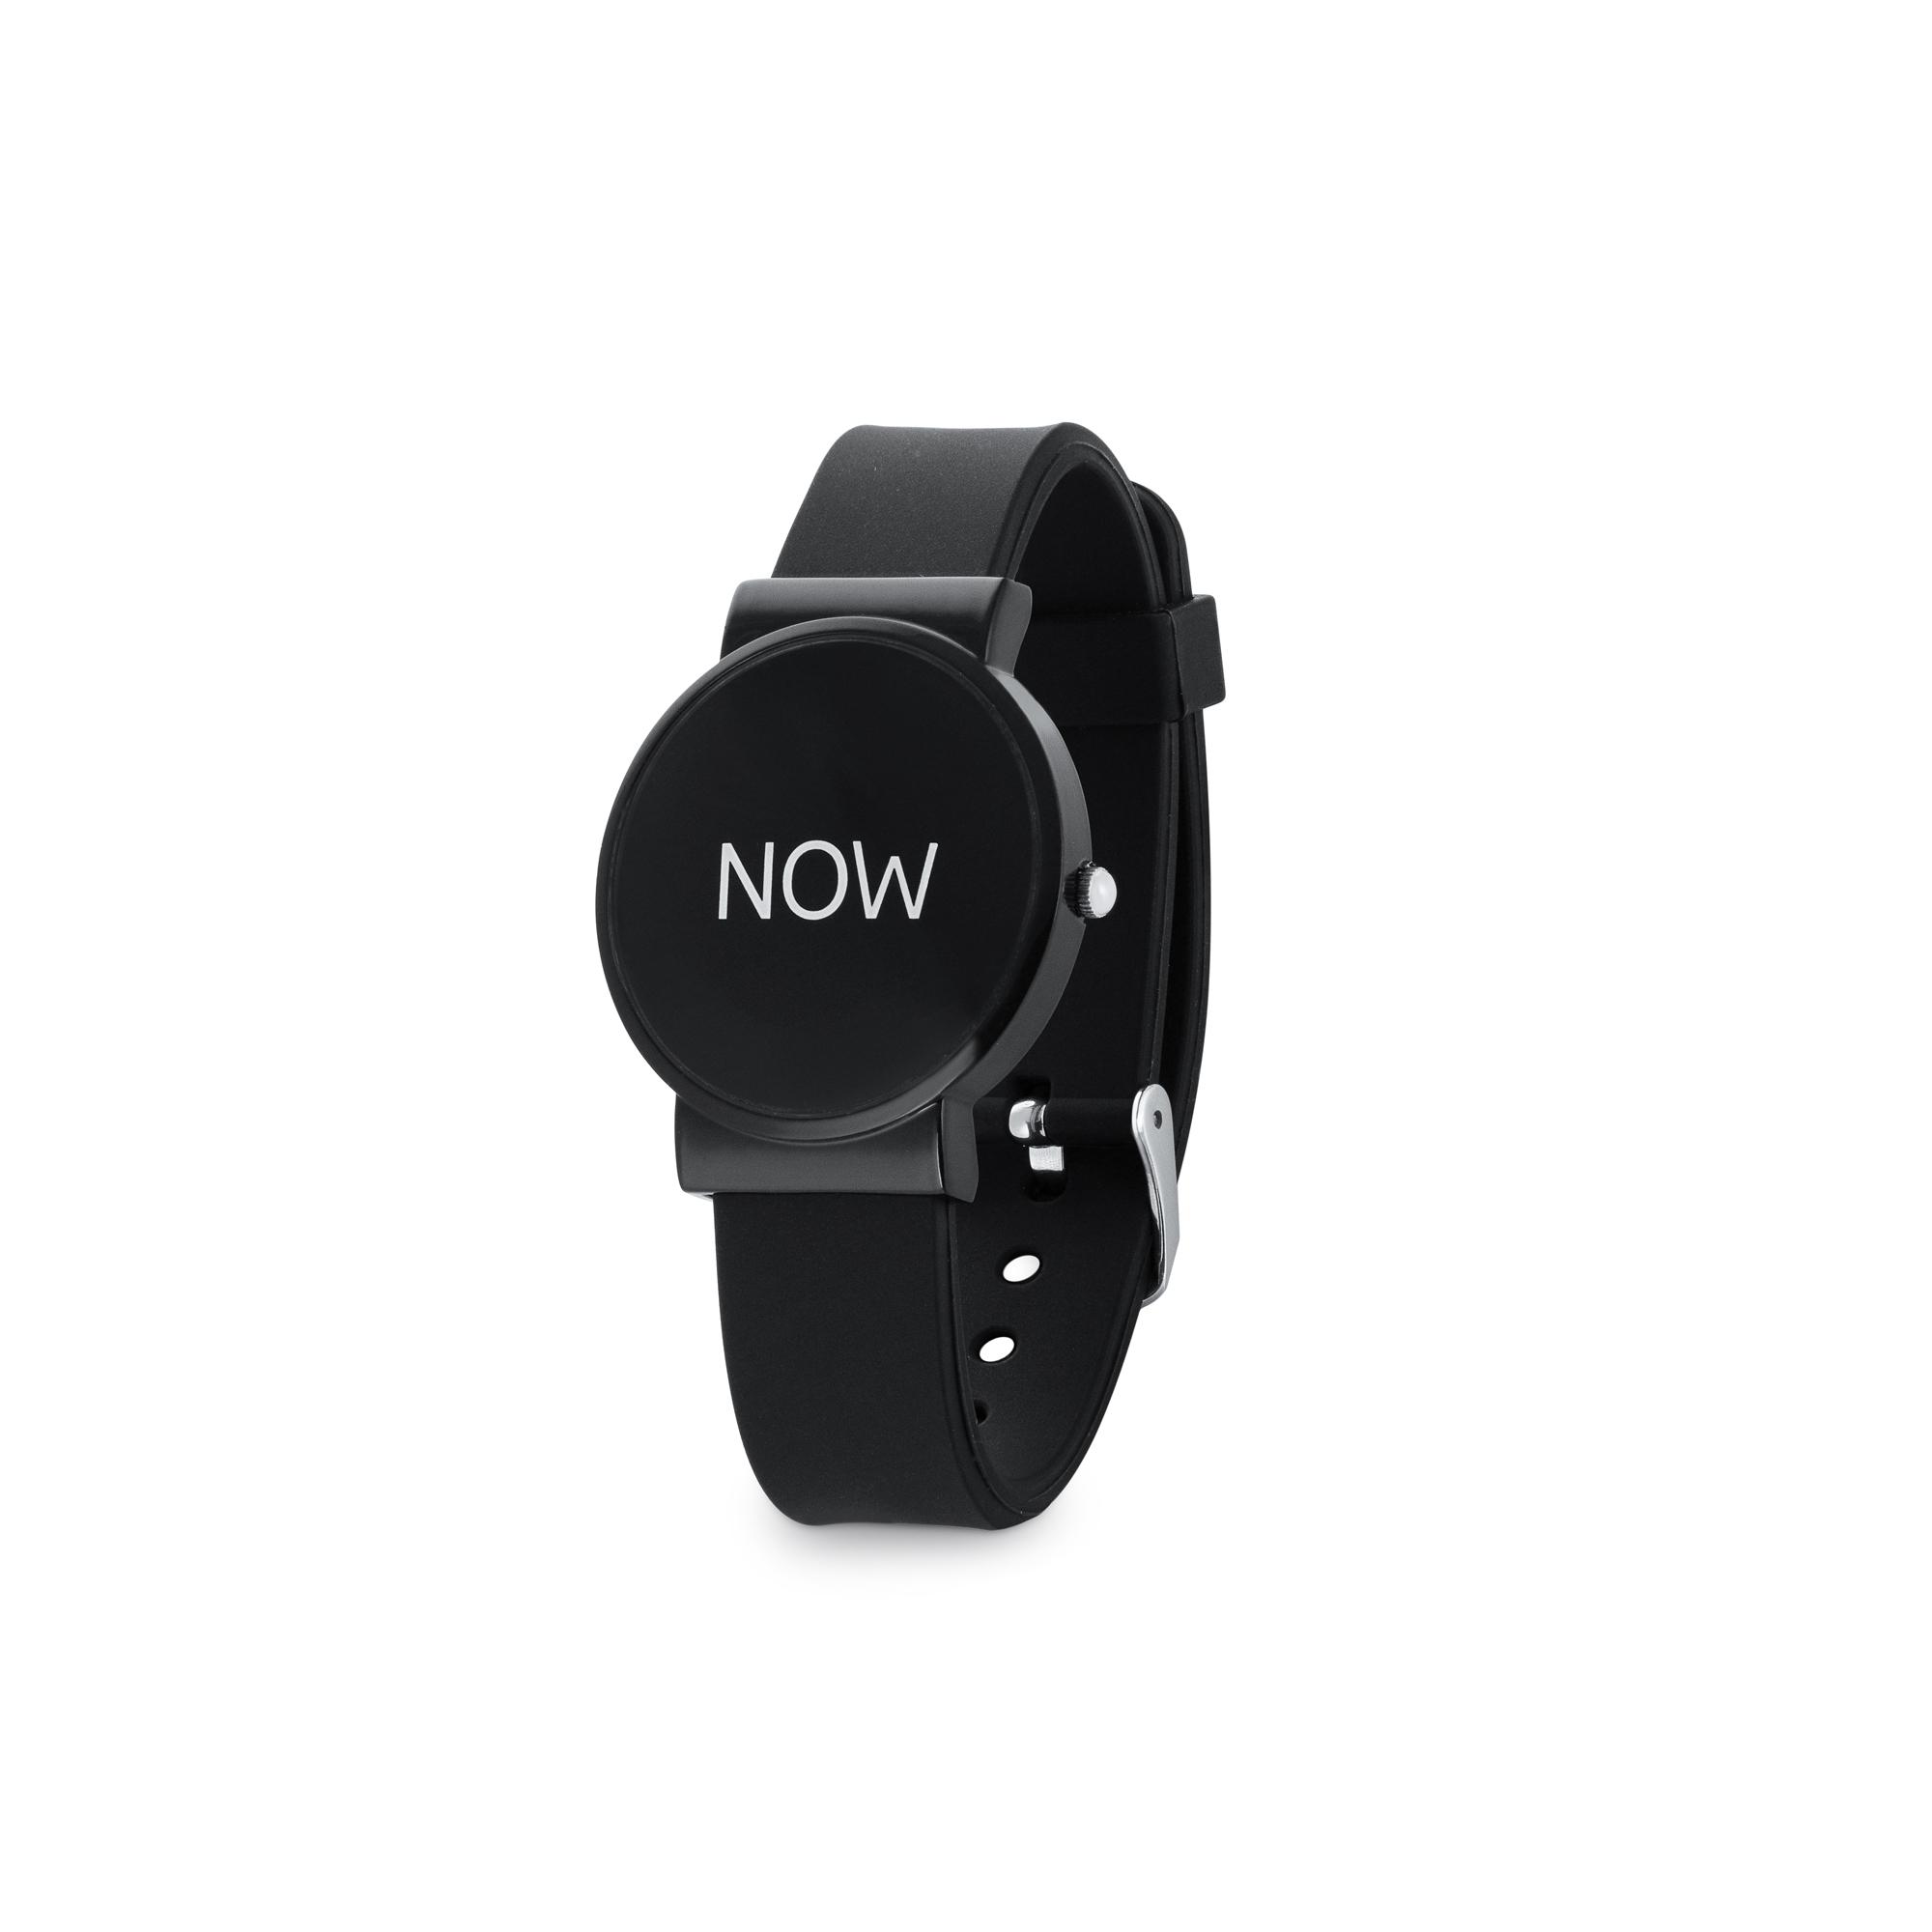 now-watch-black-color